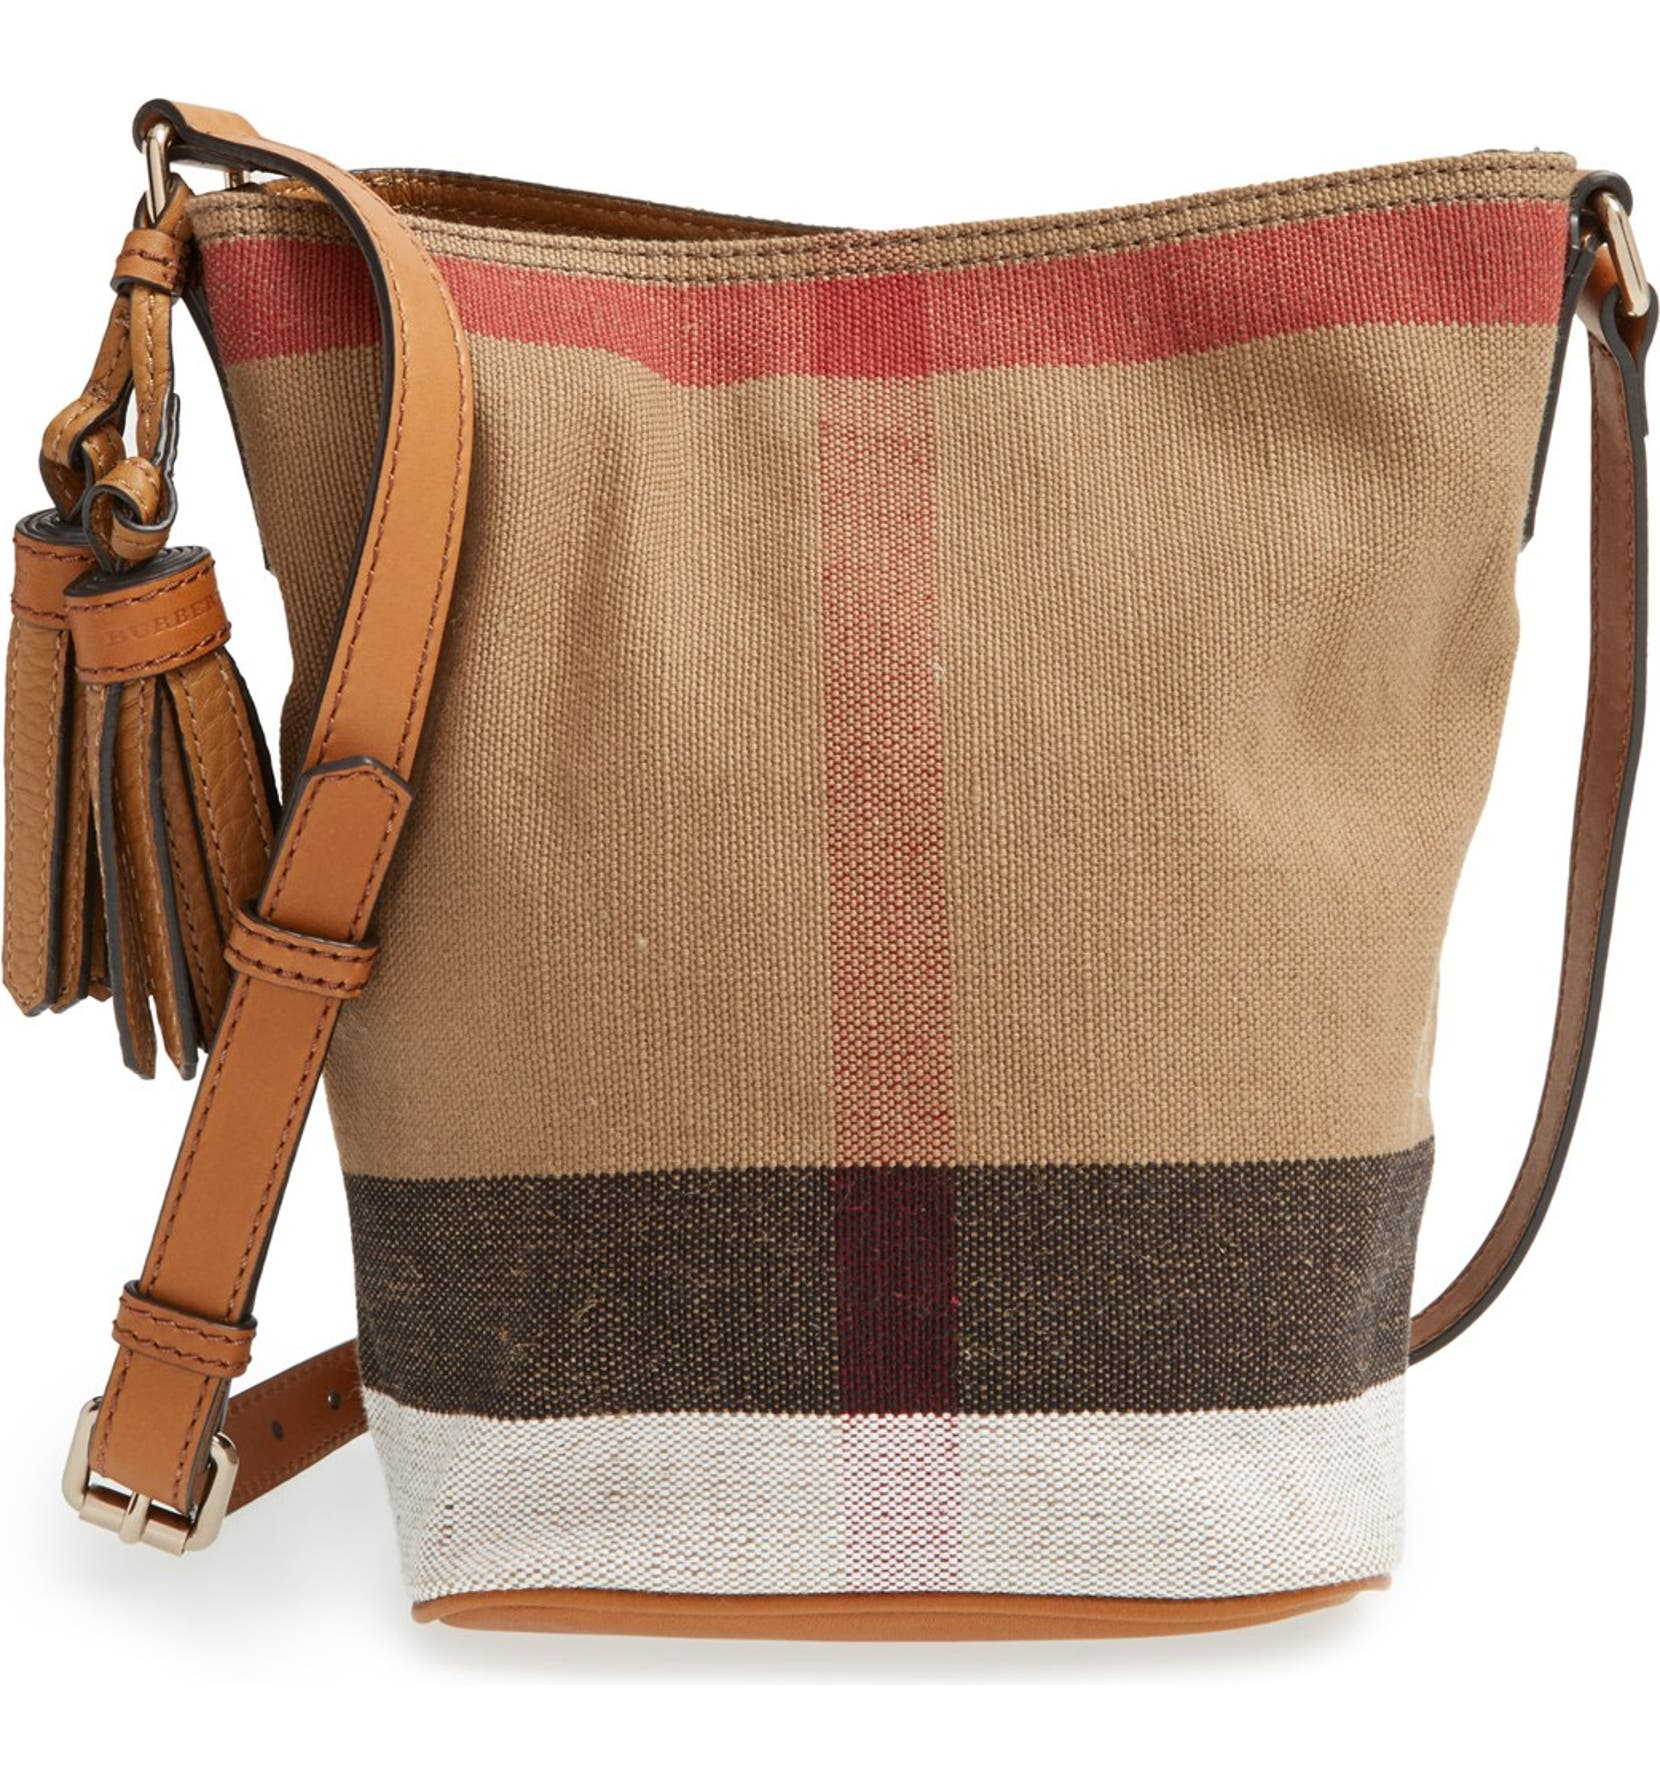 0c227ae59c93 Burberry Mini Check Canvas Backpack